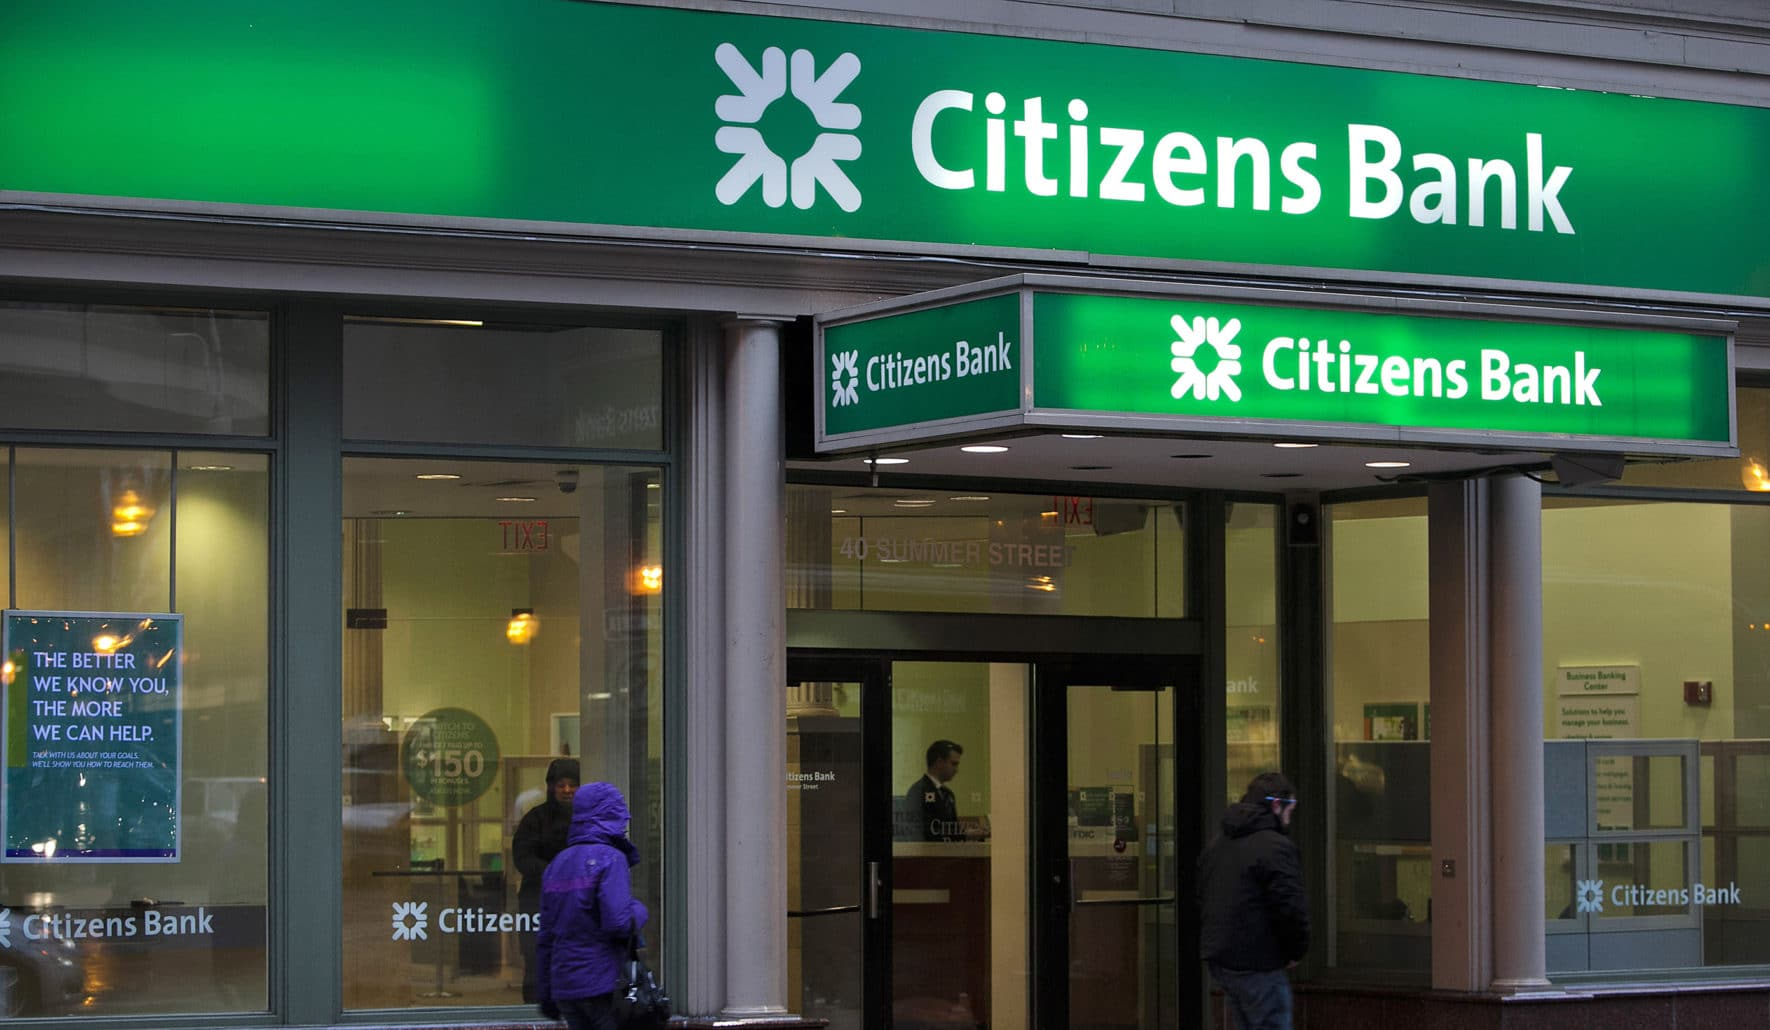 Citizens-Bank uses oracle hcm cloud